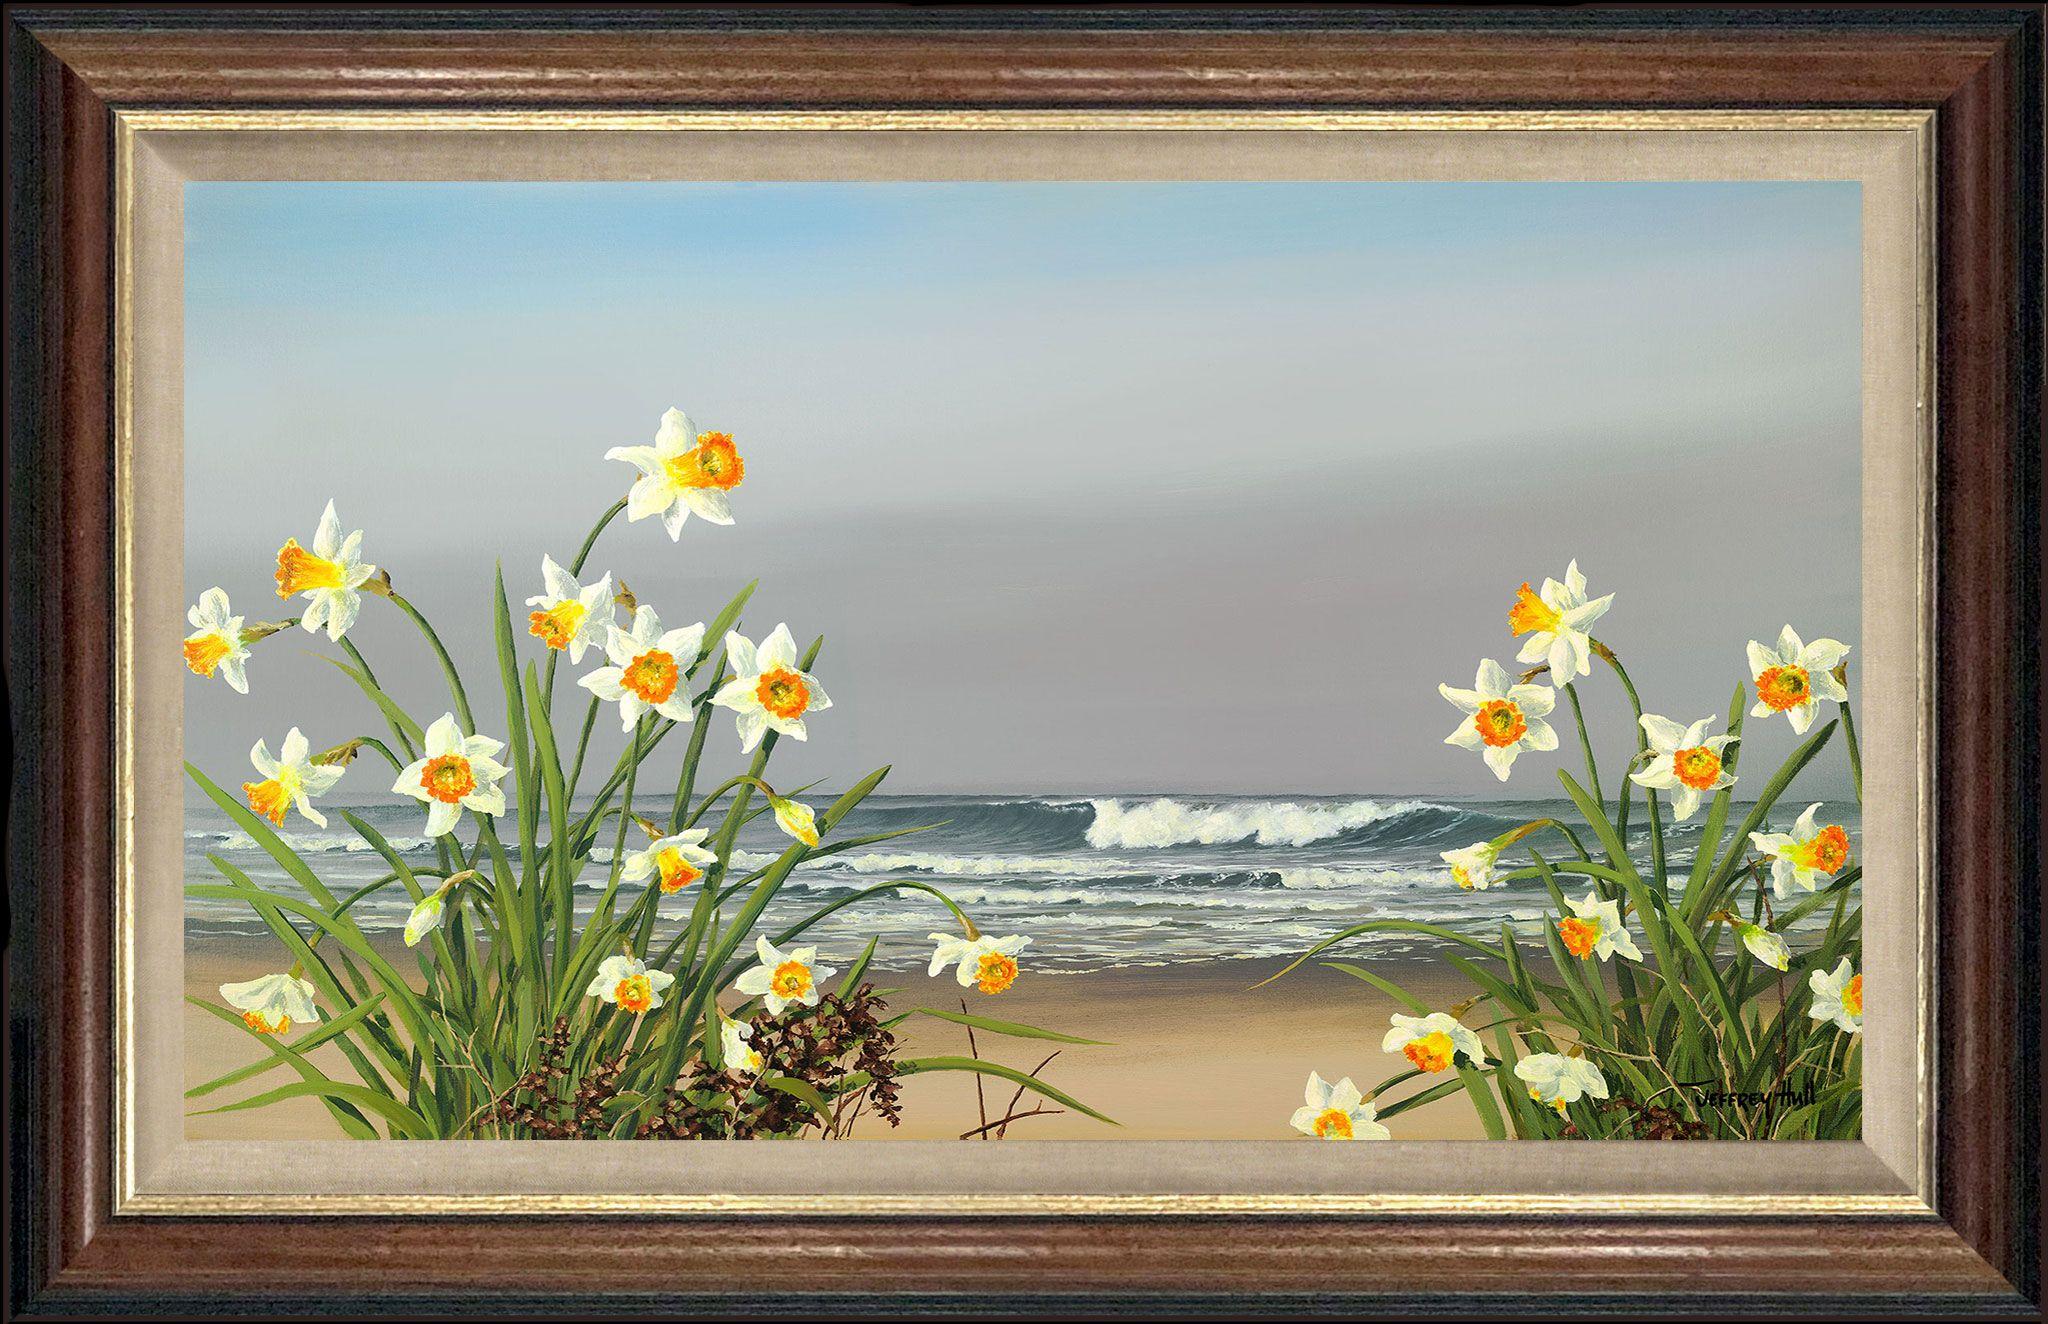 Shoreline-Daffodils-OpenEd-Malabar-Natural-Liner-4-Website-2021